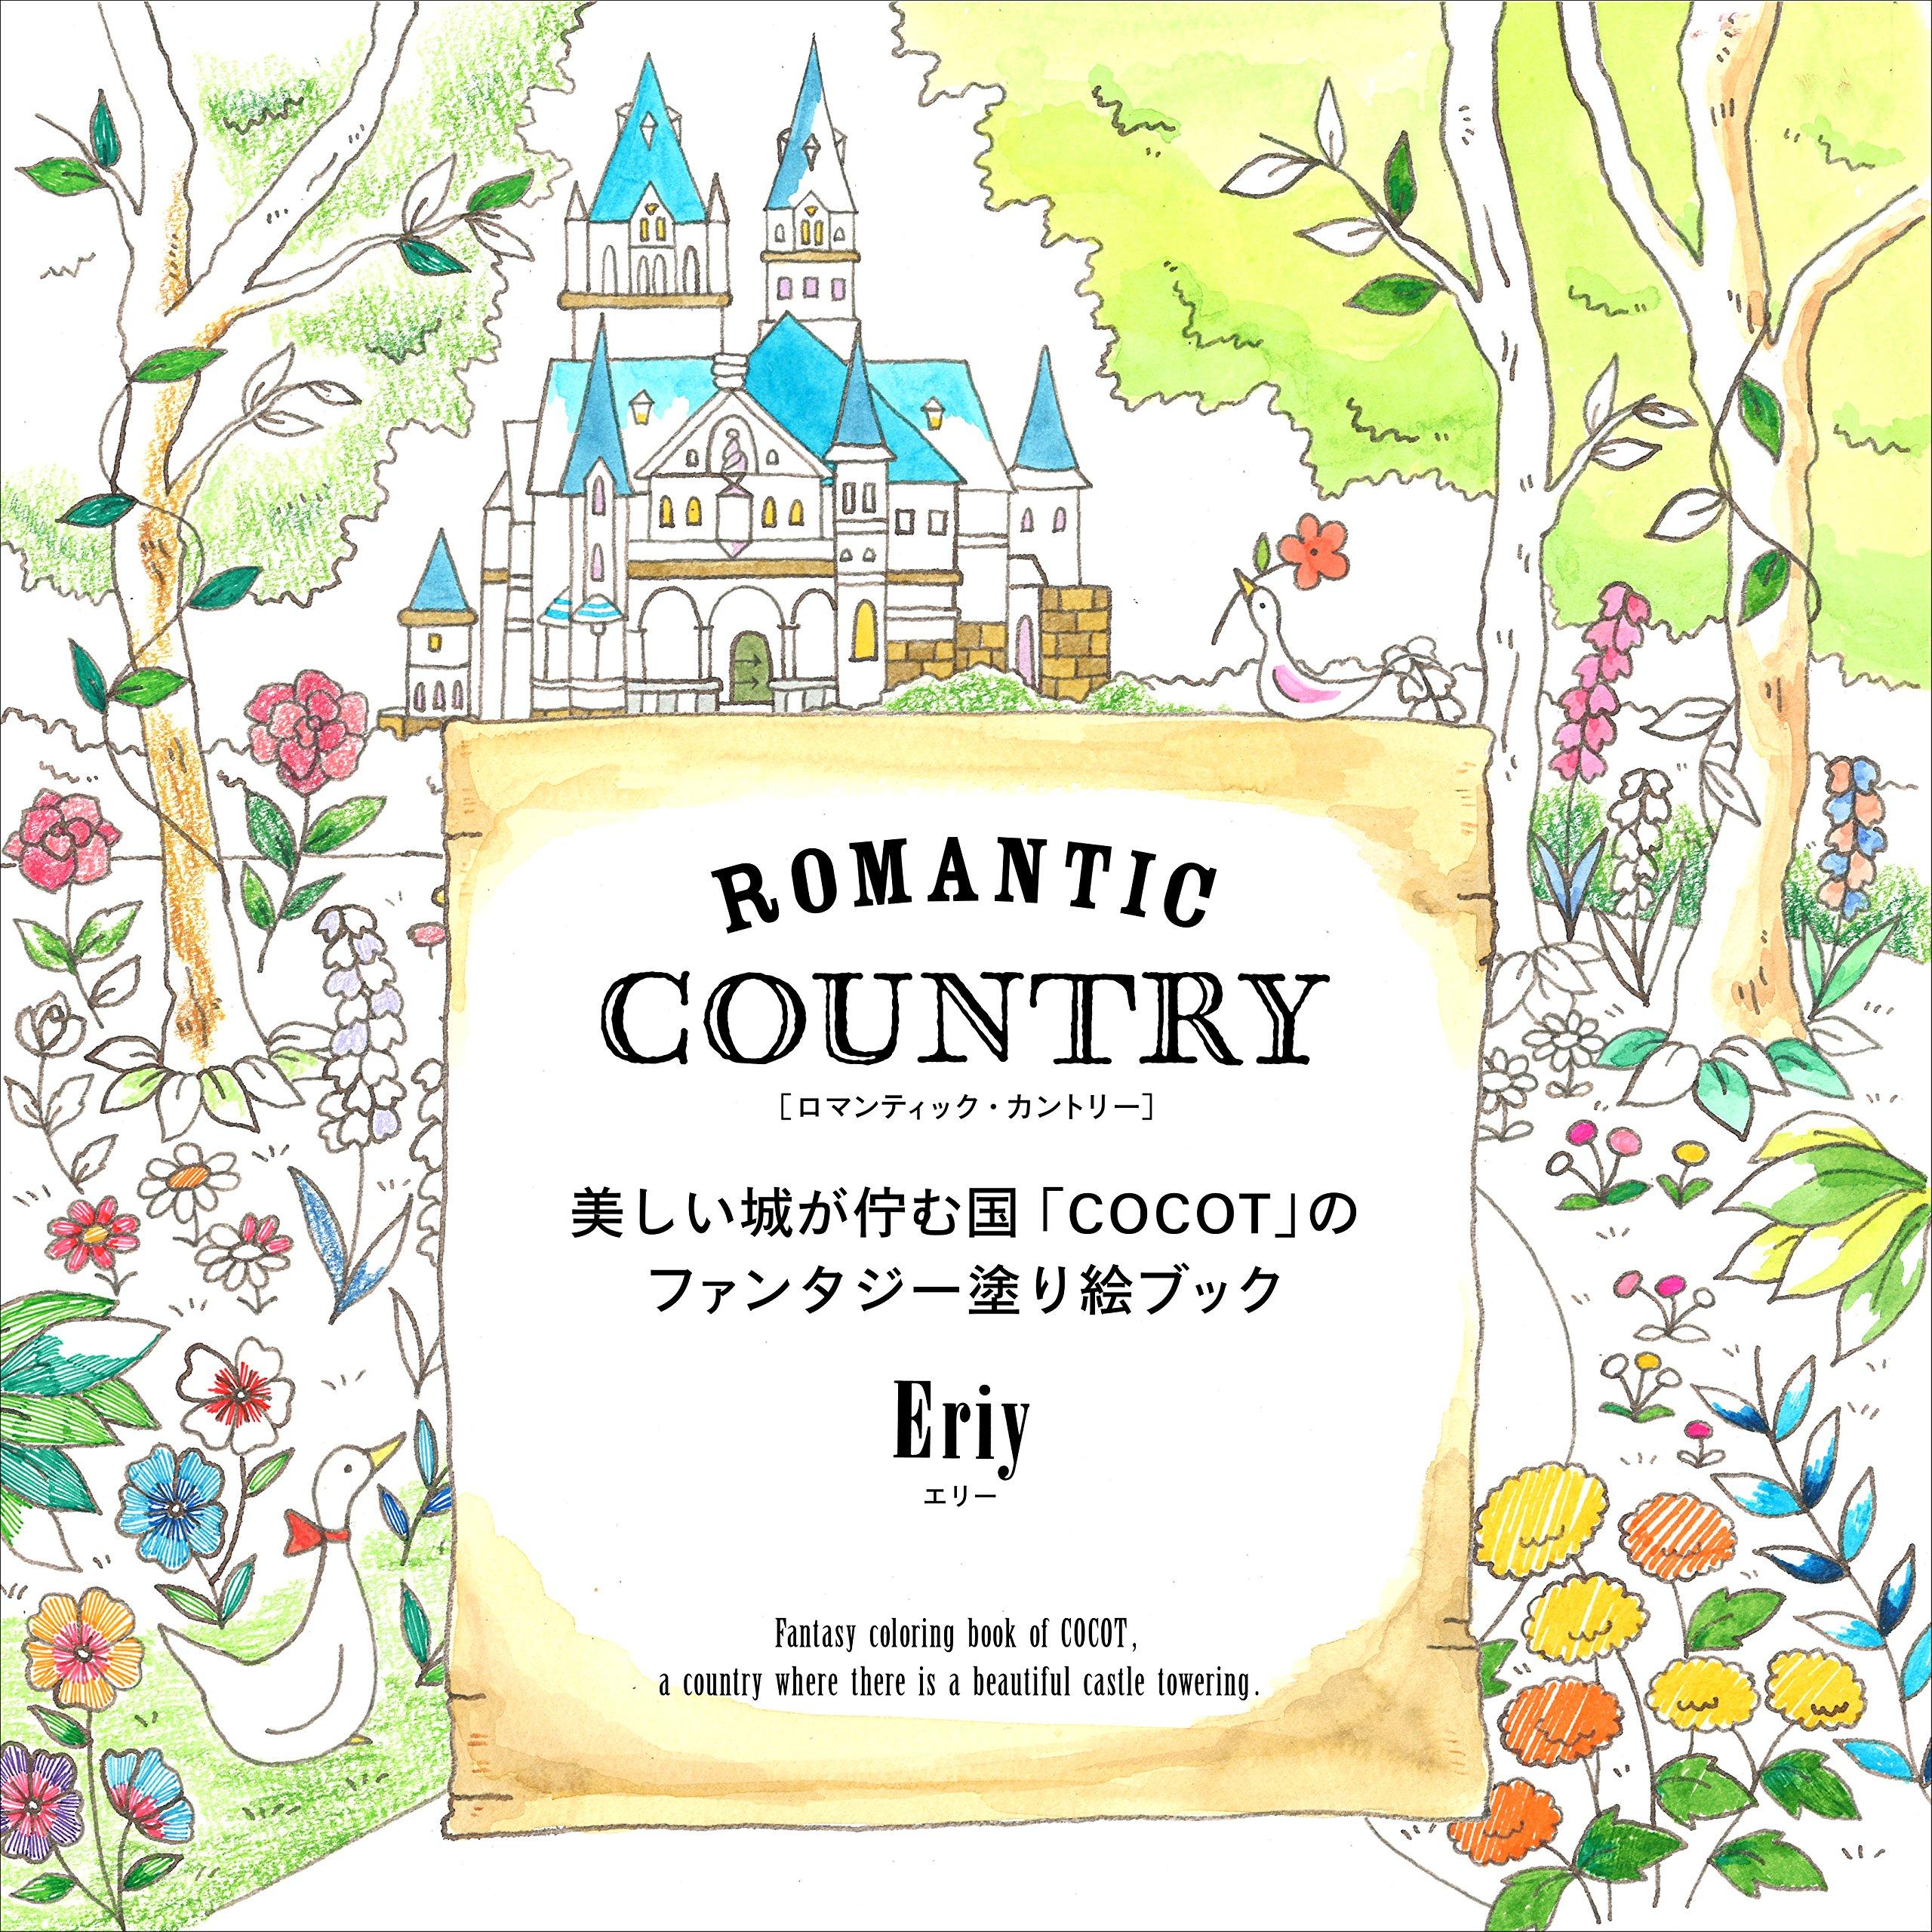 romantic country ロマンティック カントリー 美しい城が佇む国 cocot